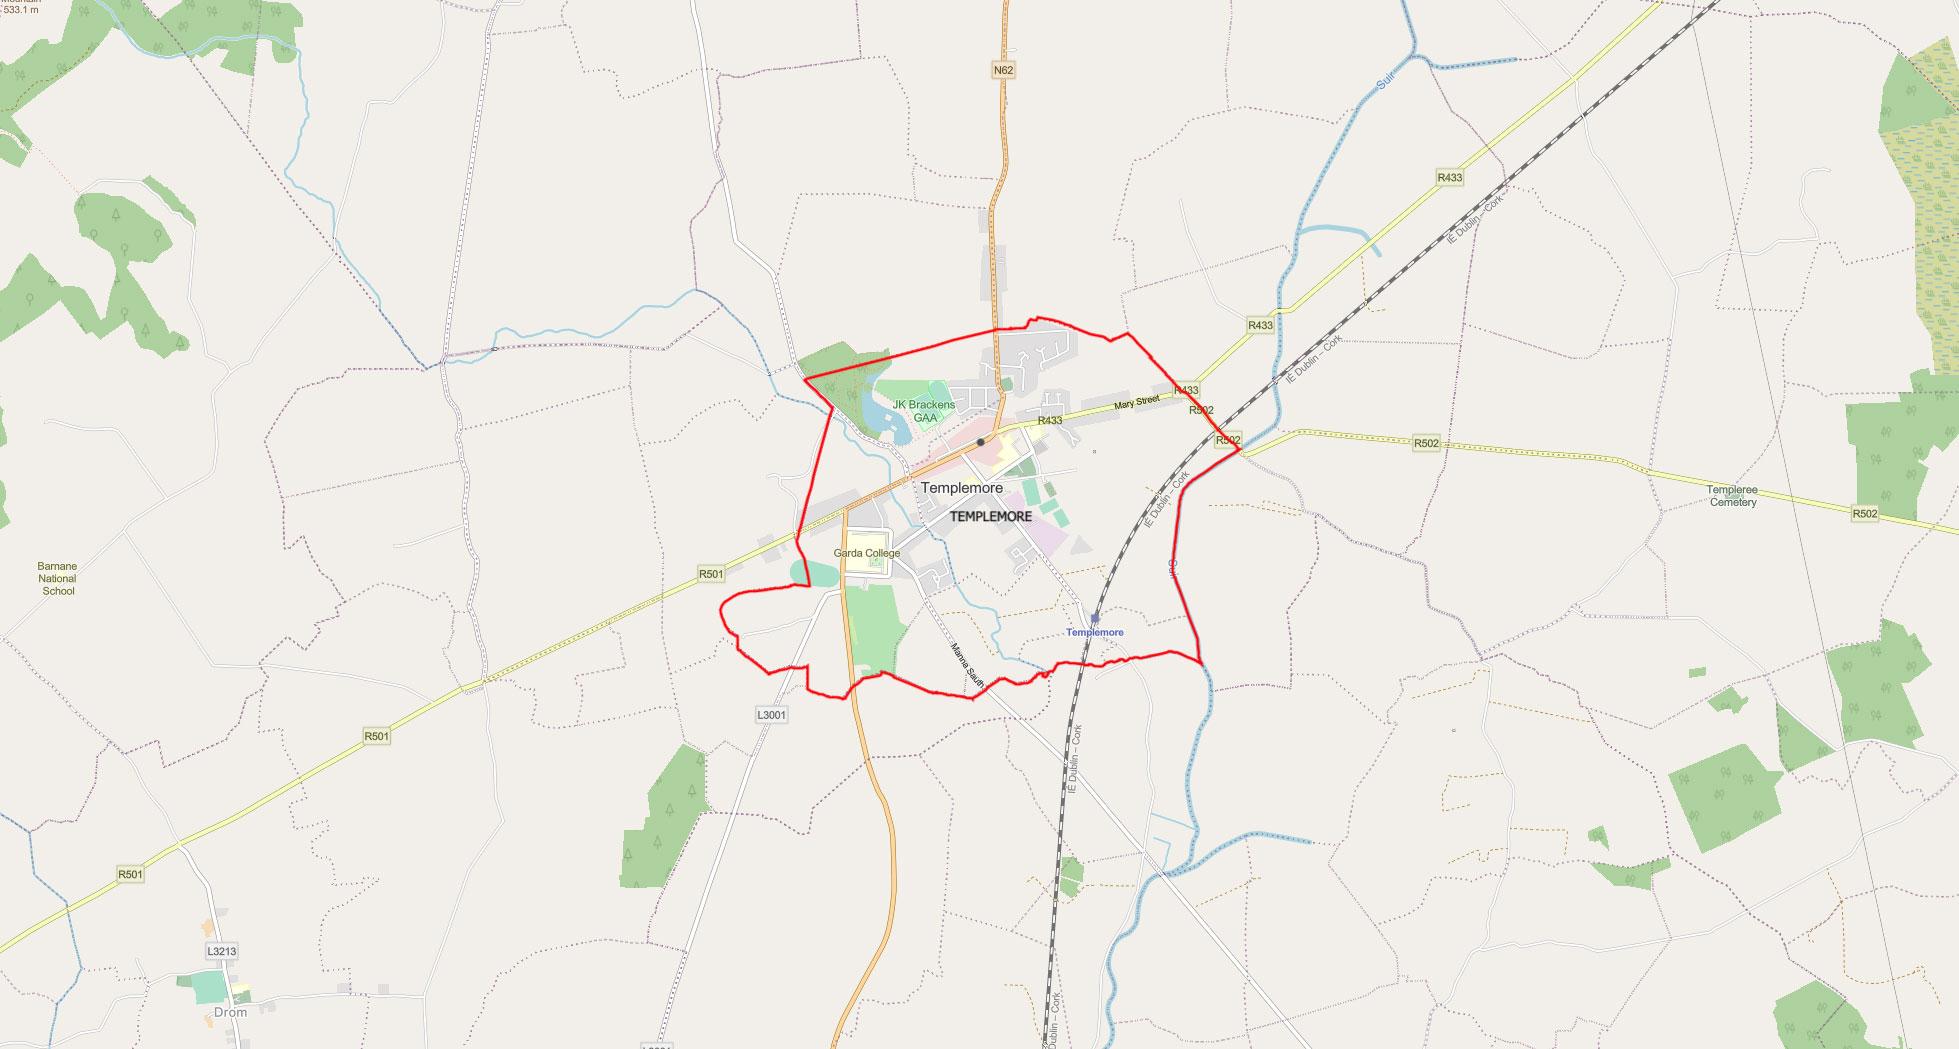 solar-panels-templemore-tipperary-ireland-map-img